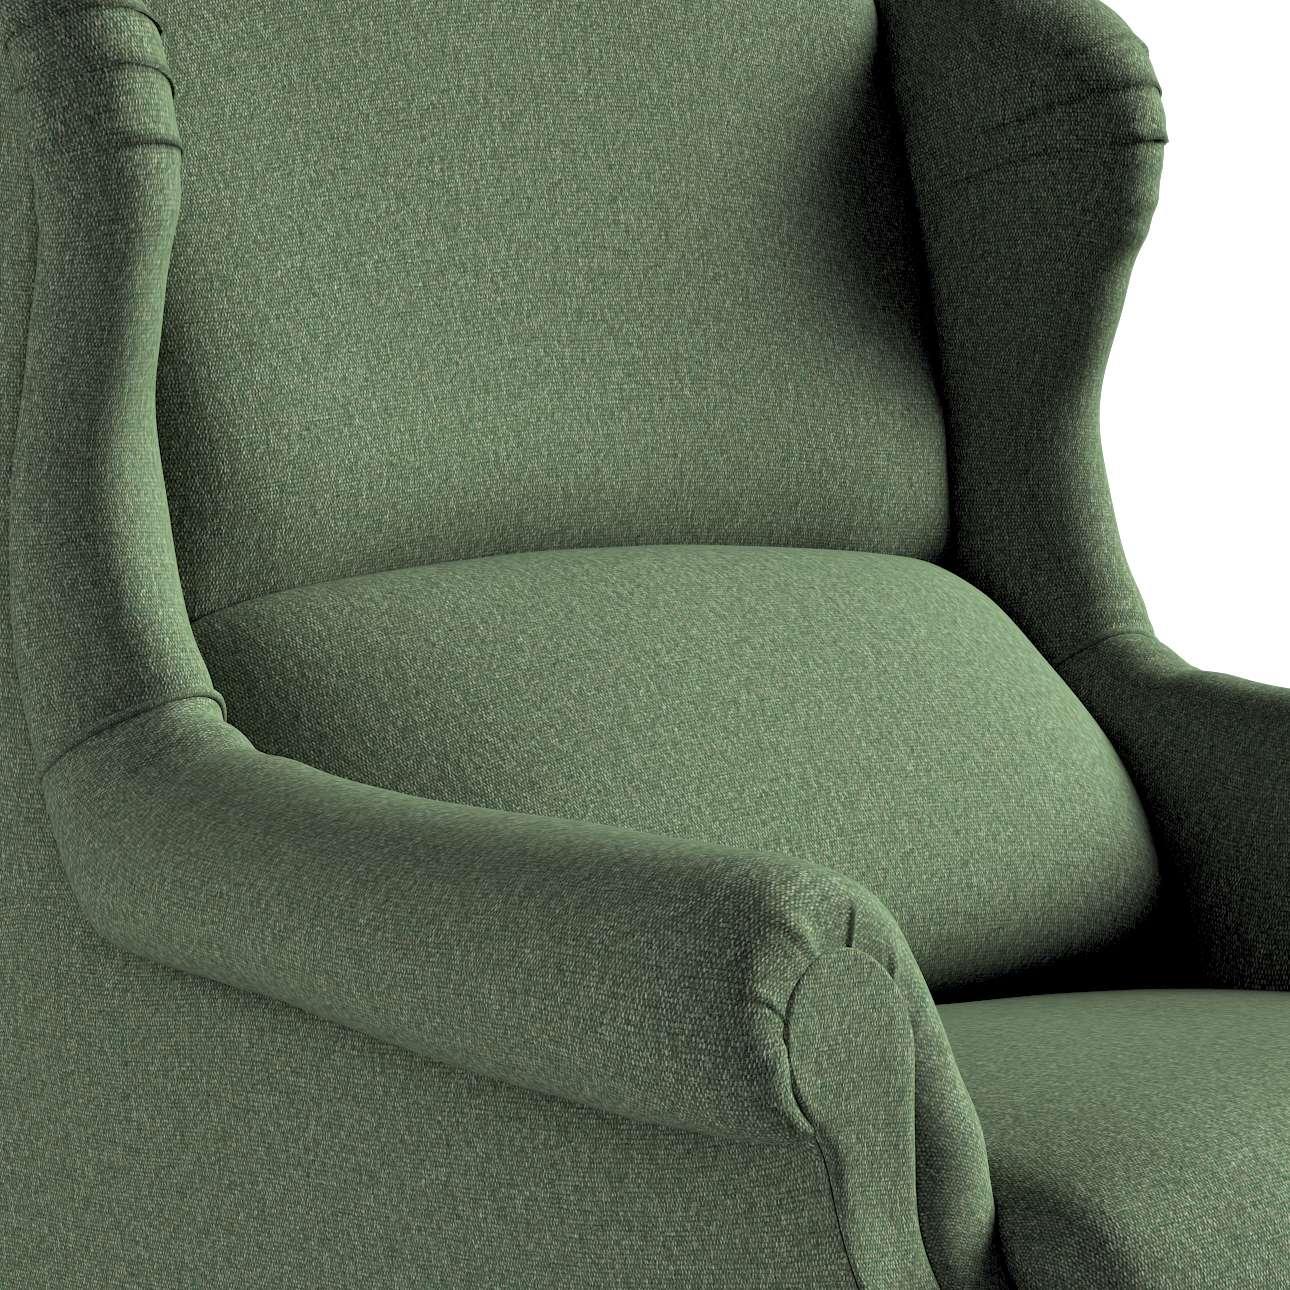 Fotel Unique w kolekcji Amsterdam, tkanina: 704-44